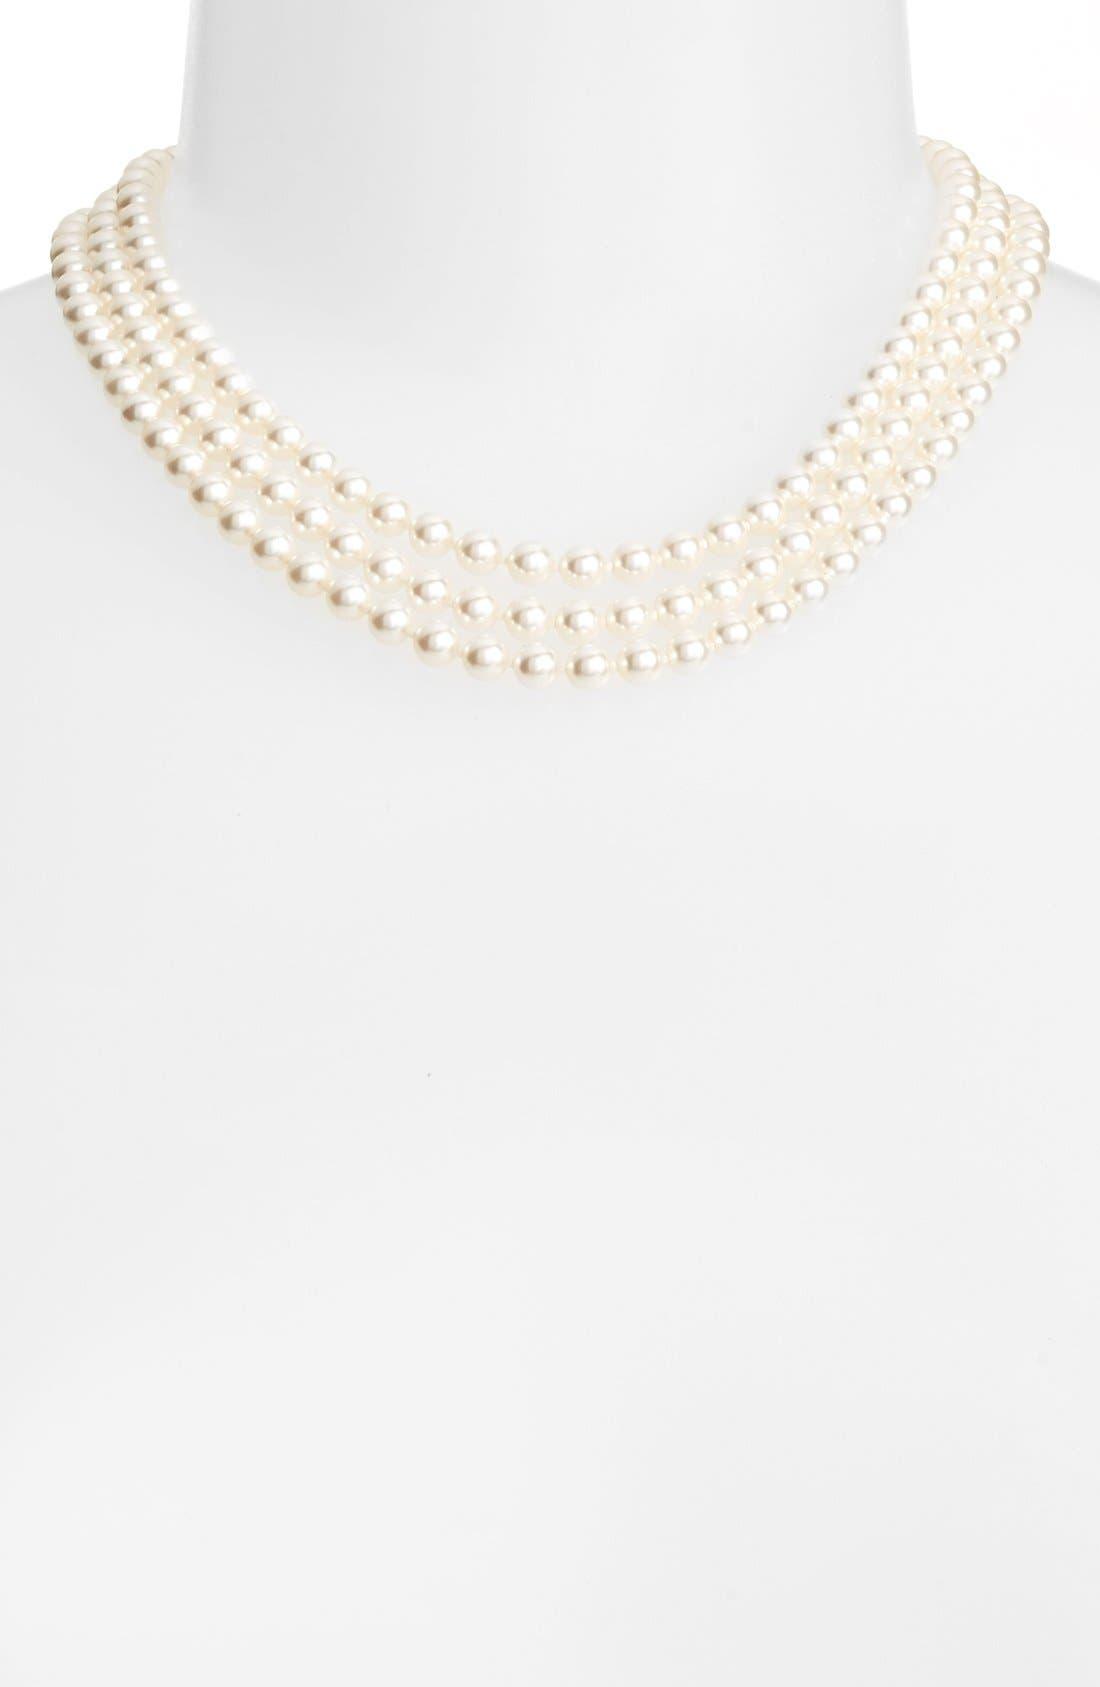 NADRI Multistrand Imitation Pearl Necklace, Main, color, IVORY